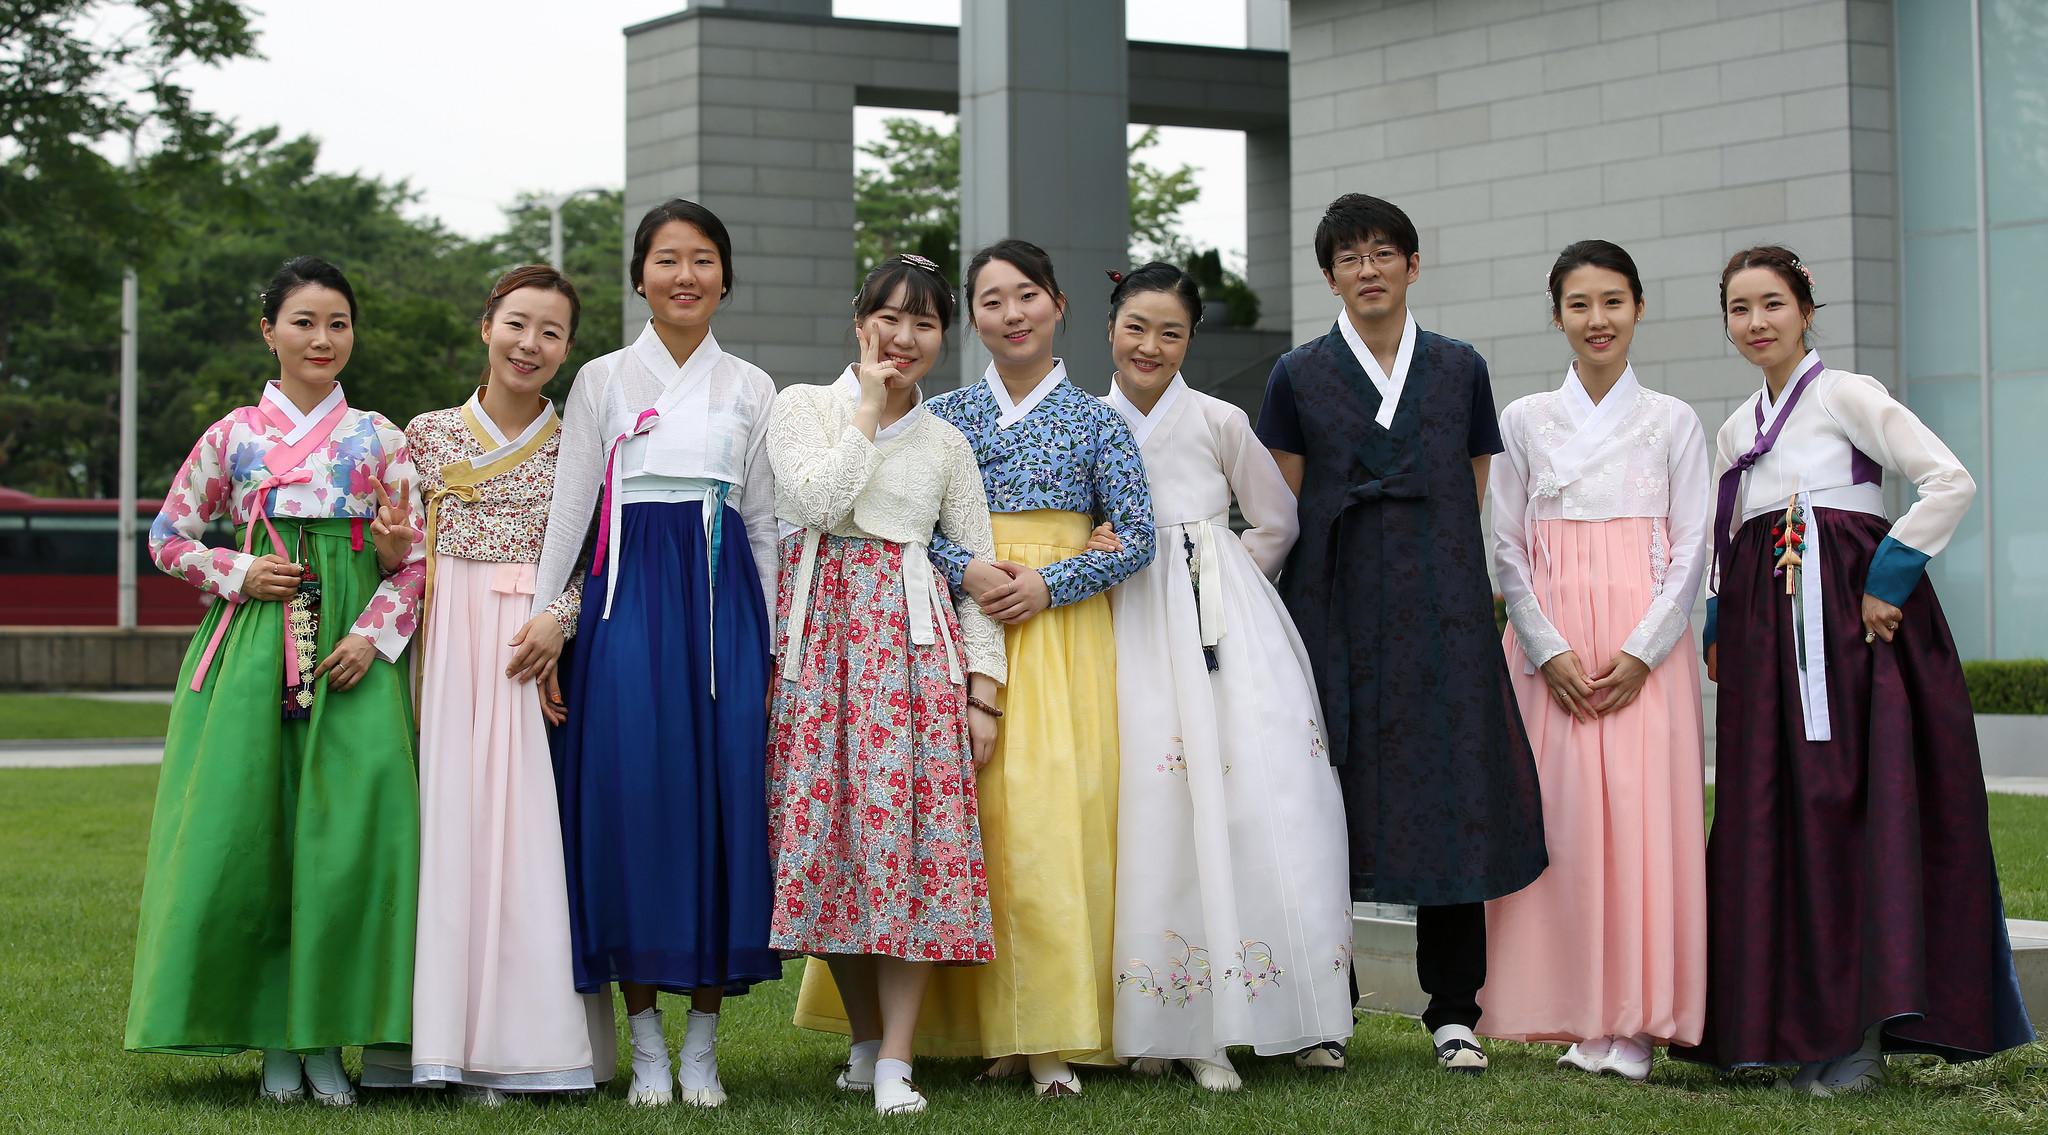 Hanbok An Introduction To South Koreas National Dress